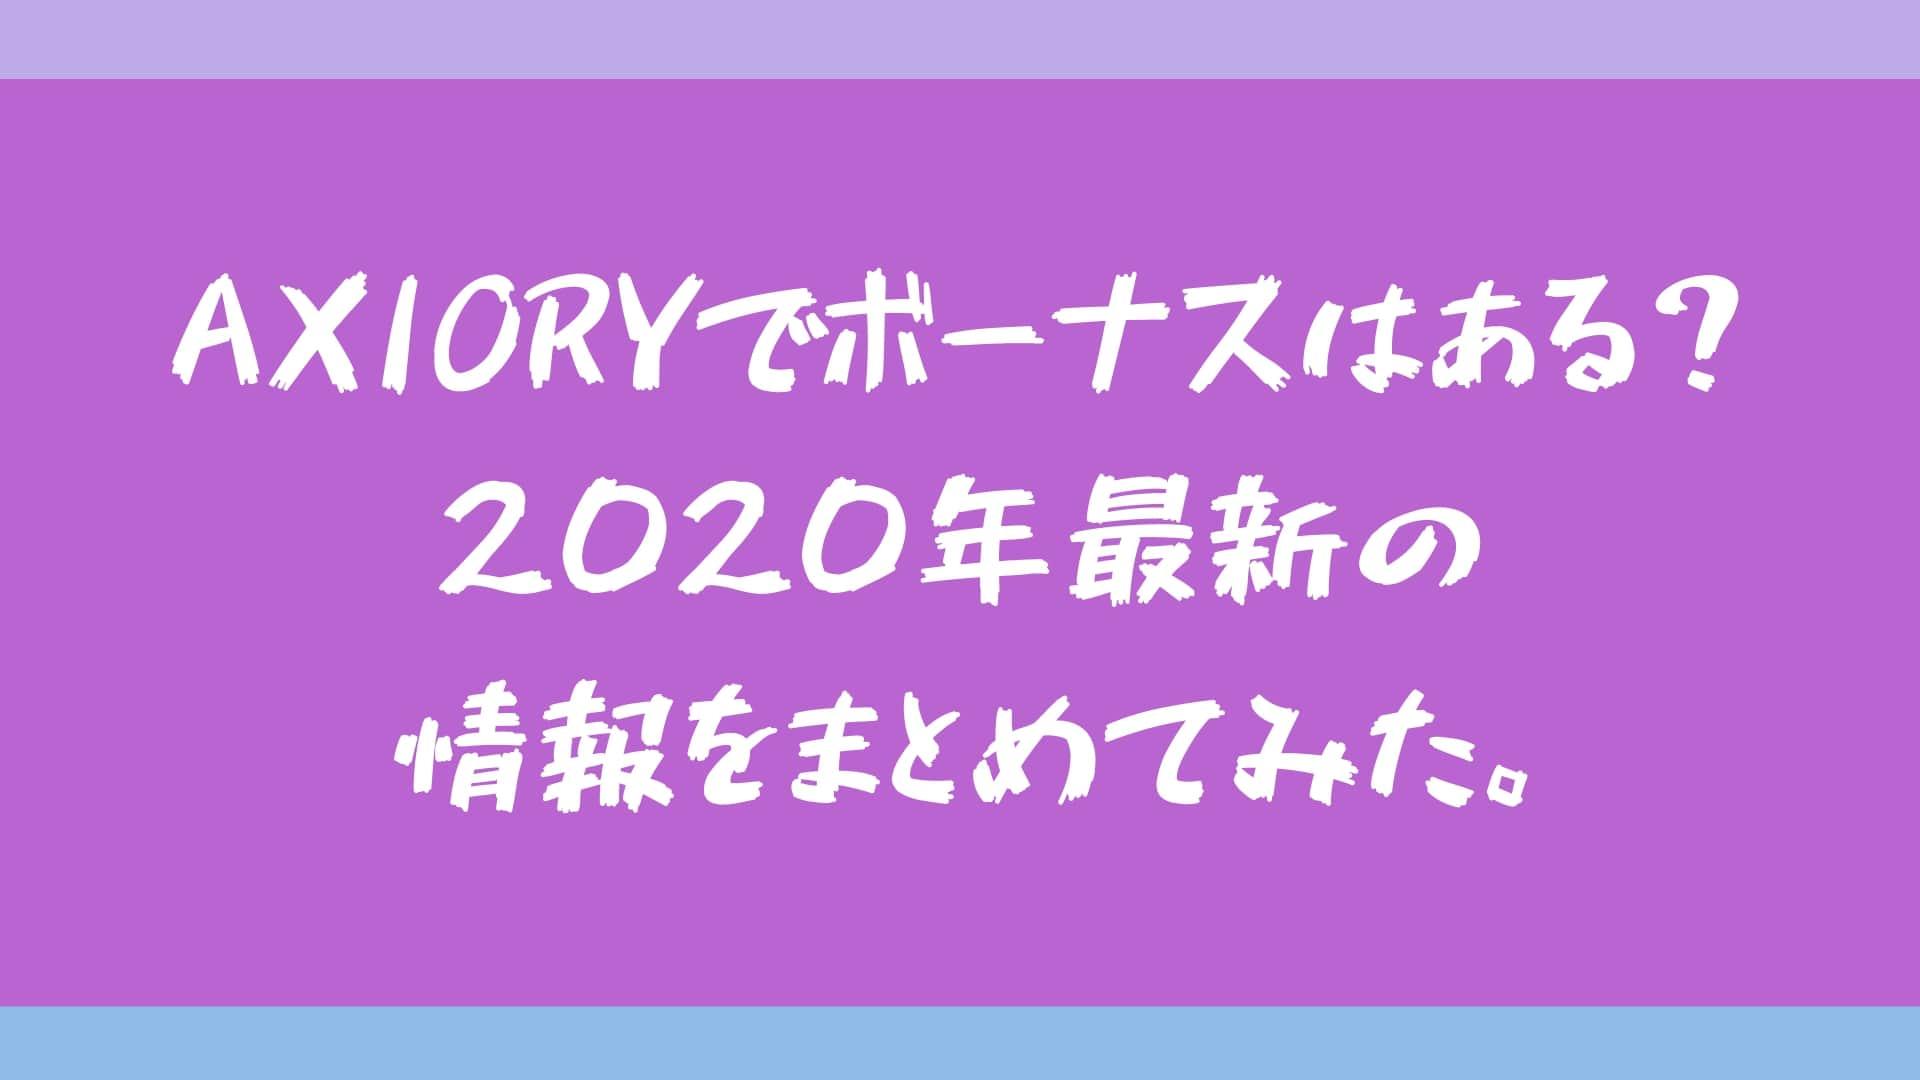 AXIORYでボーナスはある?2020年最新の情報をまとめてみた。